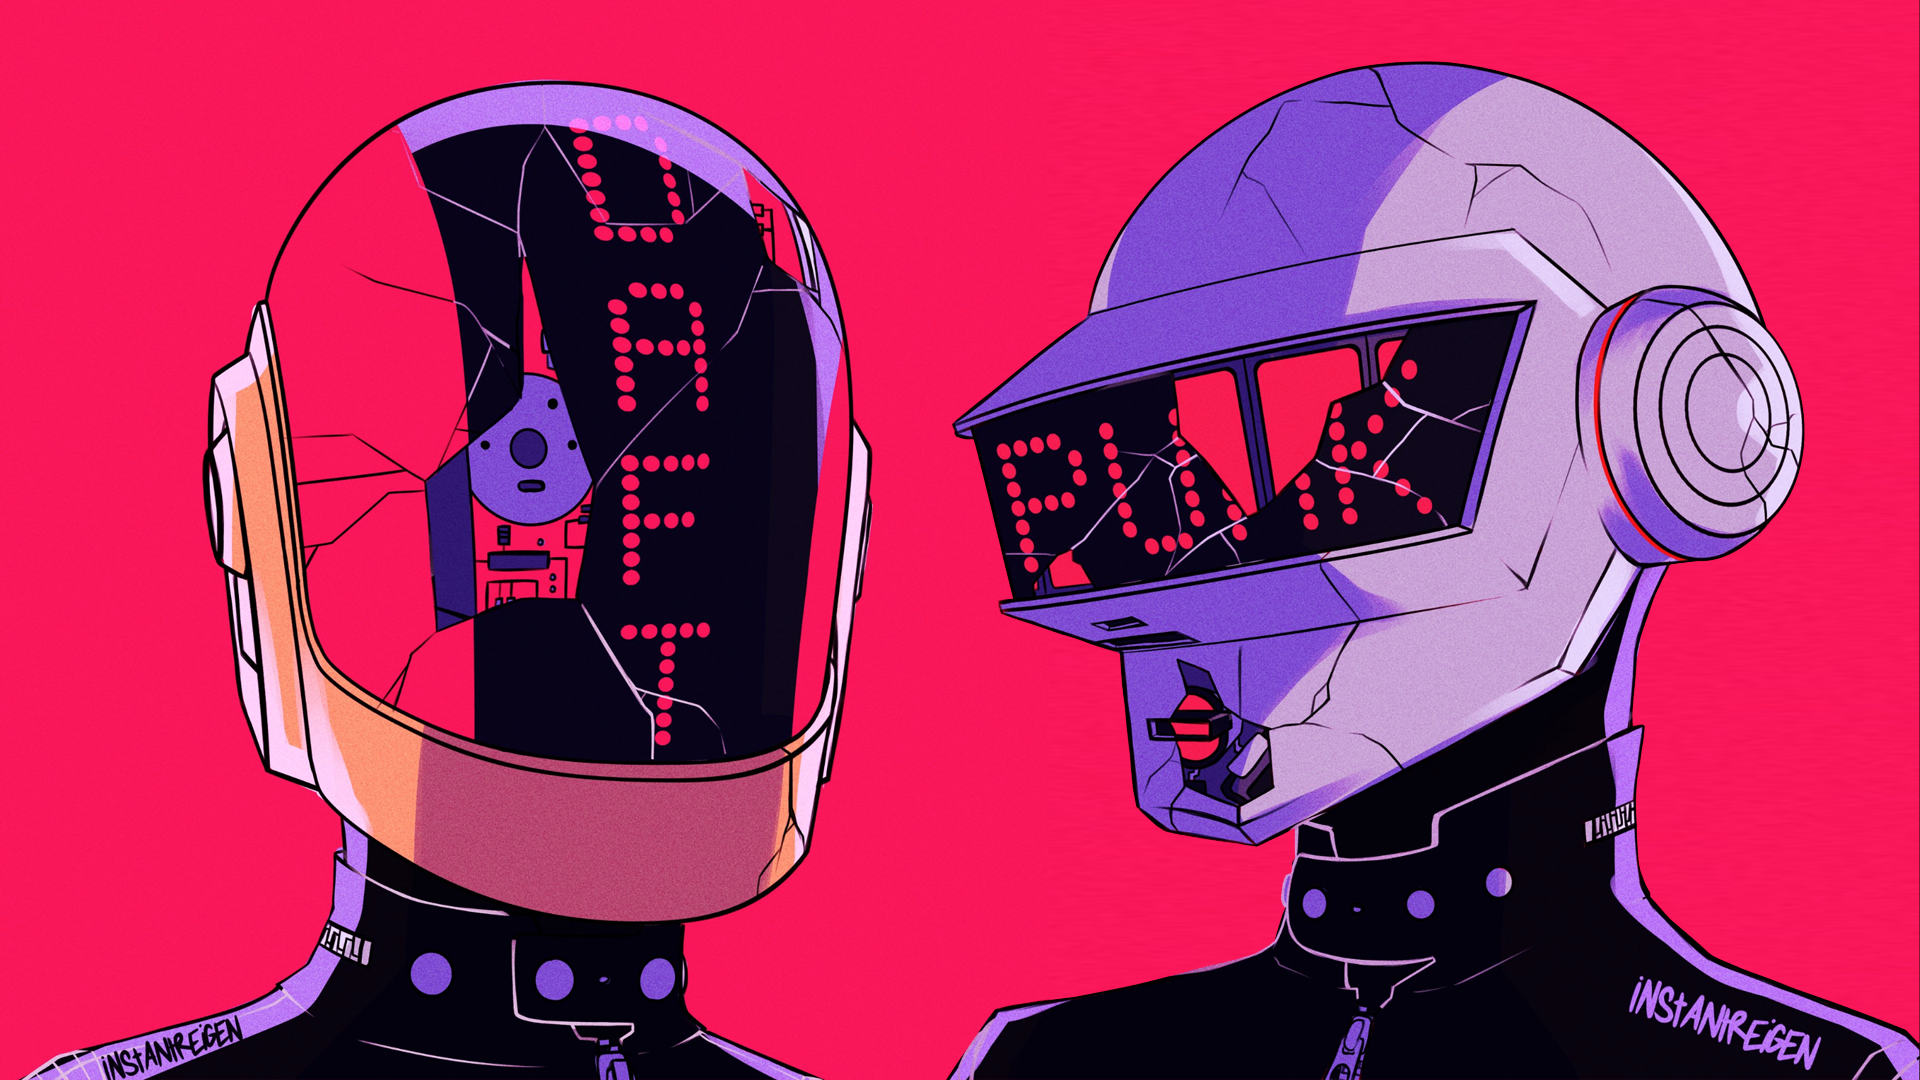 Made Myself A Daft Punk Wallpaper From Some Sweet Artwork By Instantreigen On Twitter 1920x1080 3840x1600 In 2020 Daft Punk Punk Art Music